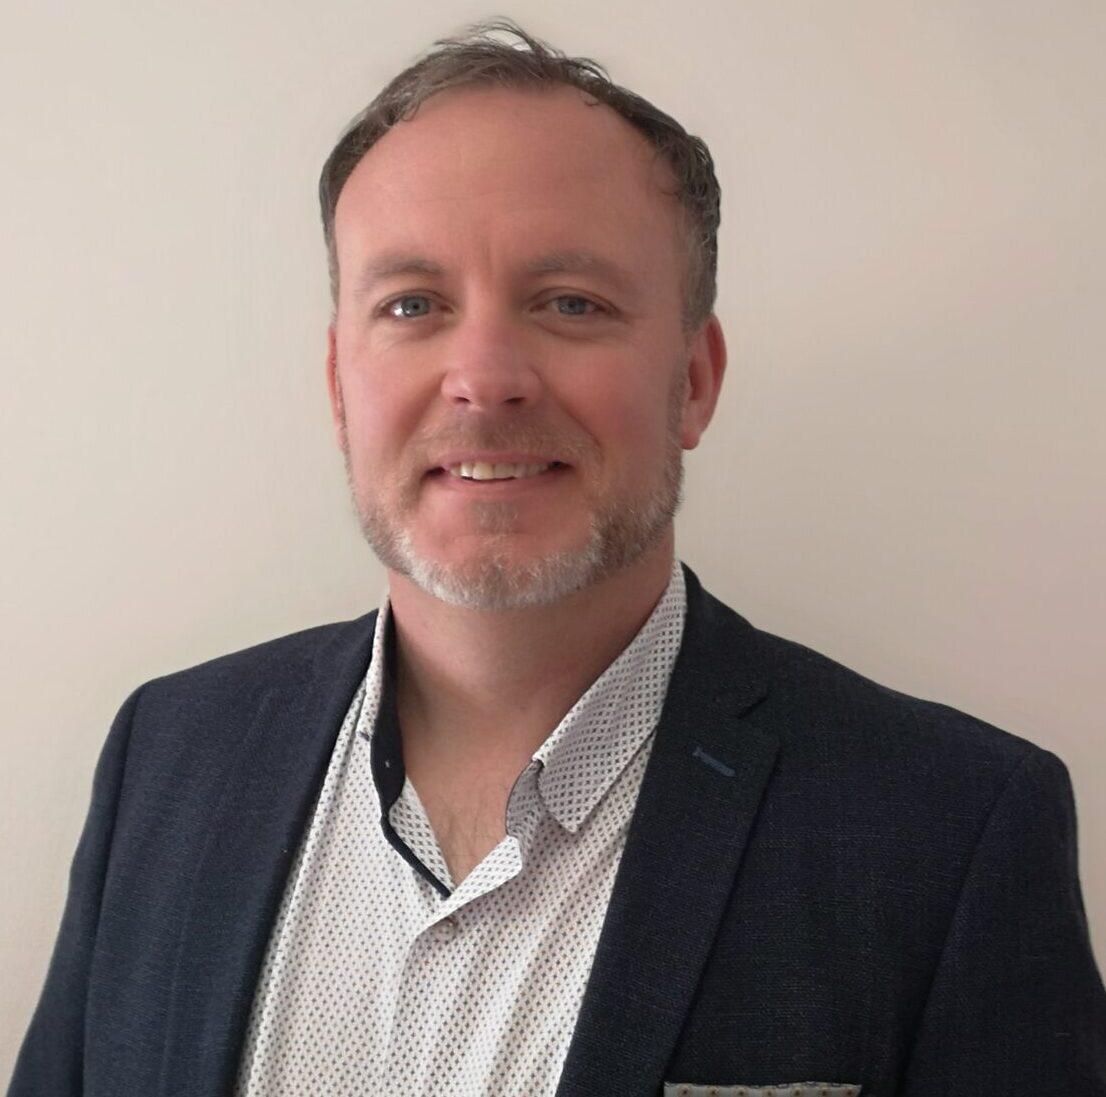 Crane Hire - Wm. O'Brien Appoints Gavin McBride as International Business Development Manager